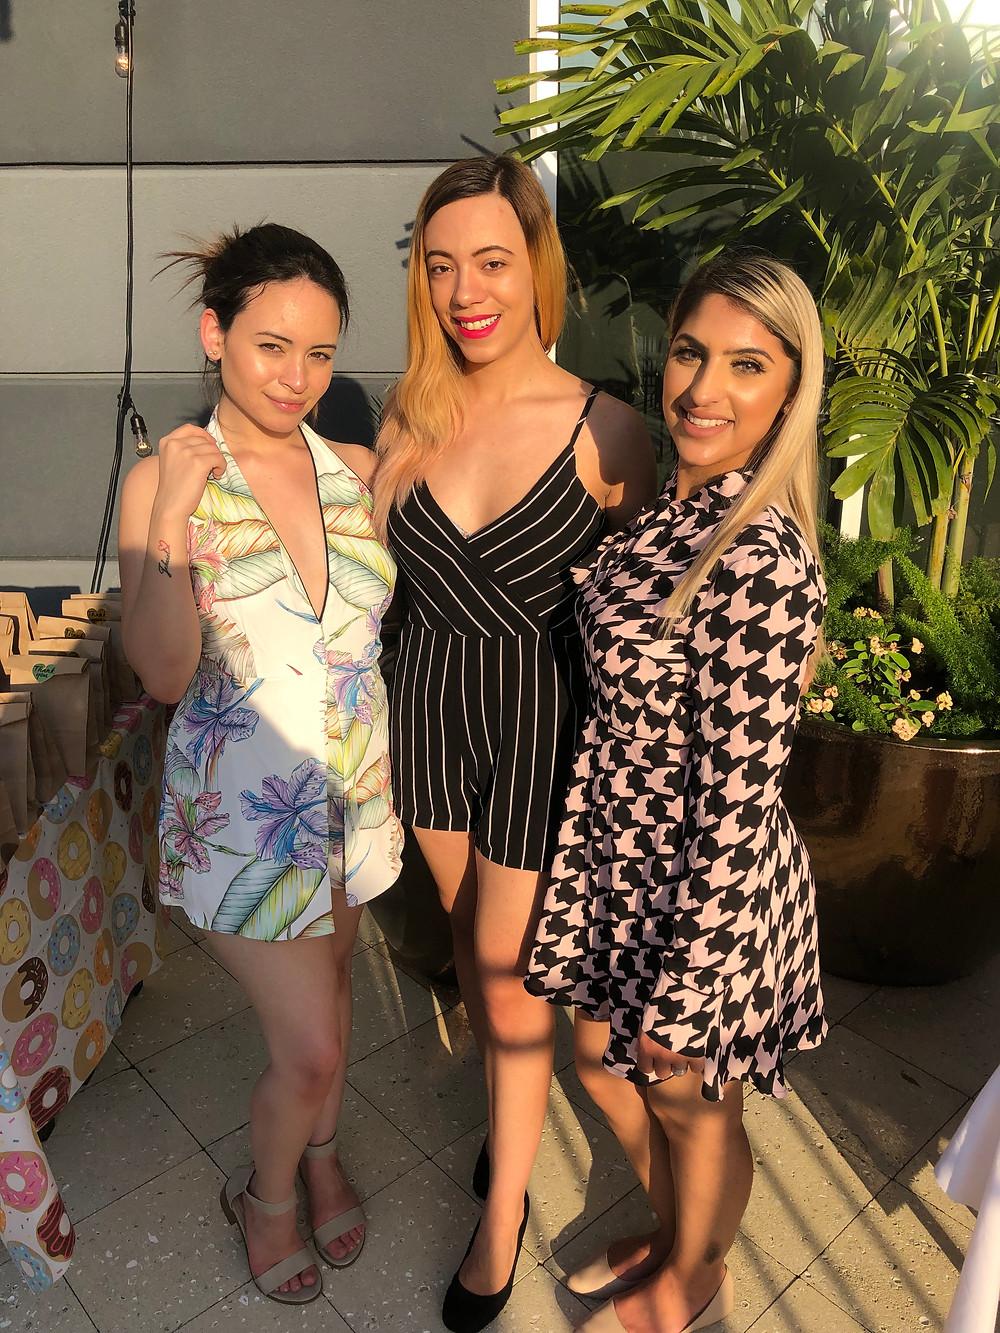 Orlando-Fashion-Bloggers-Sip-and-Mingle-Florida-Fashion-Bloggers-Katrina-Belle-Beauty-The-Brown-Blonde-Adriana-MF